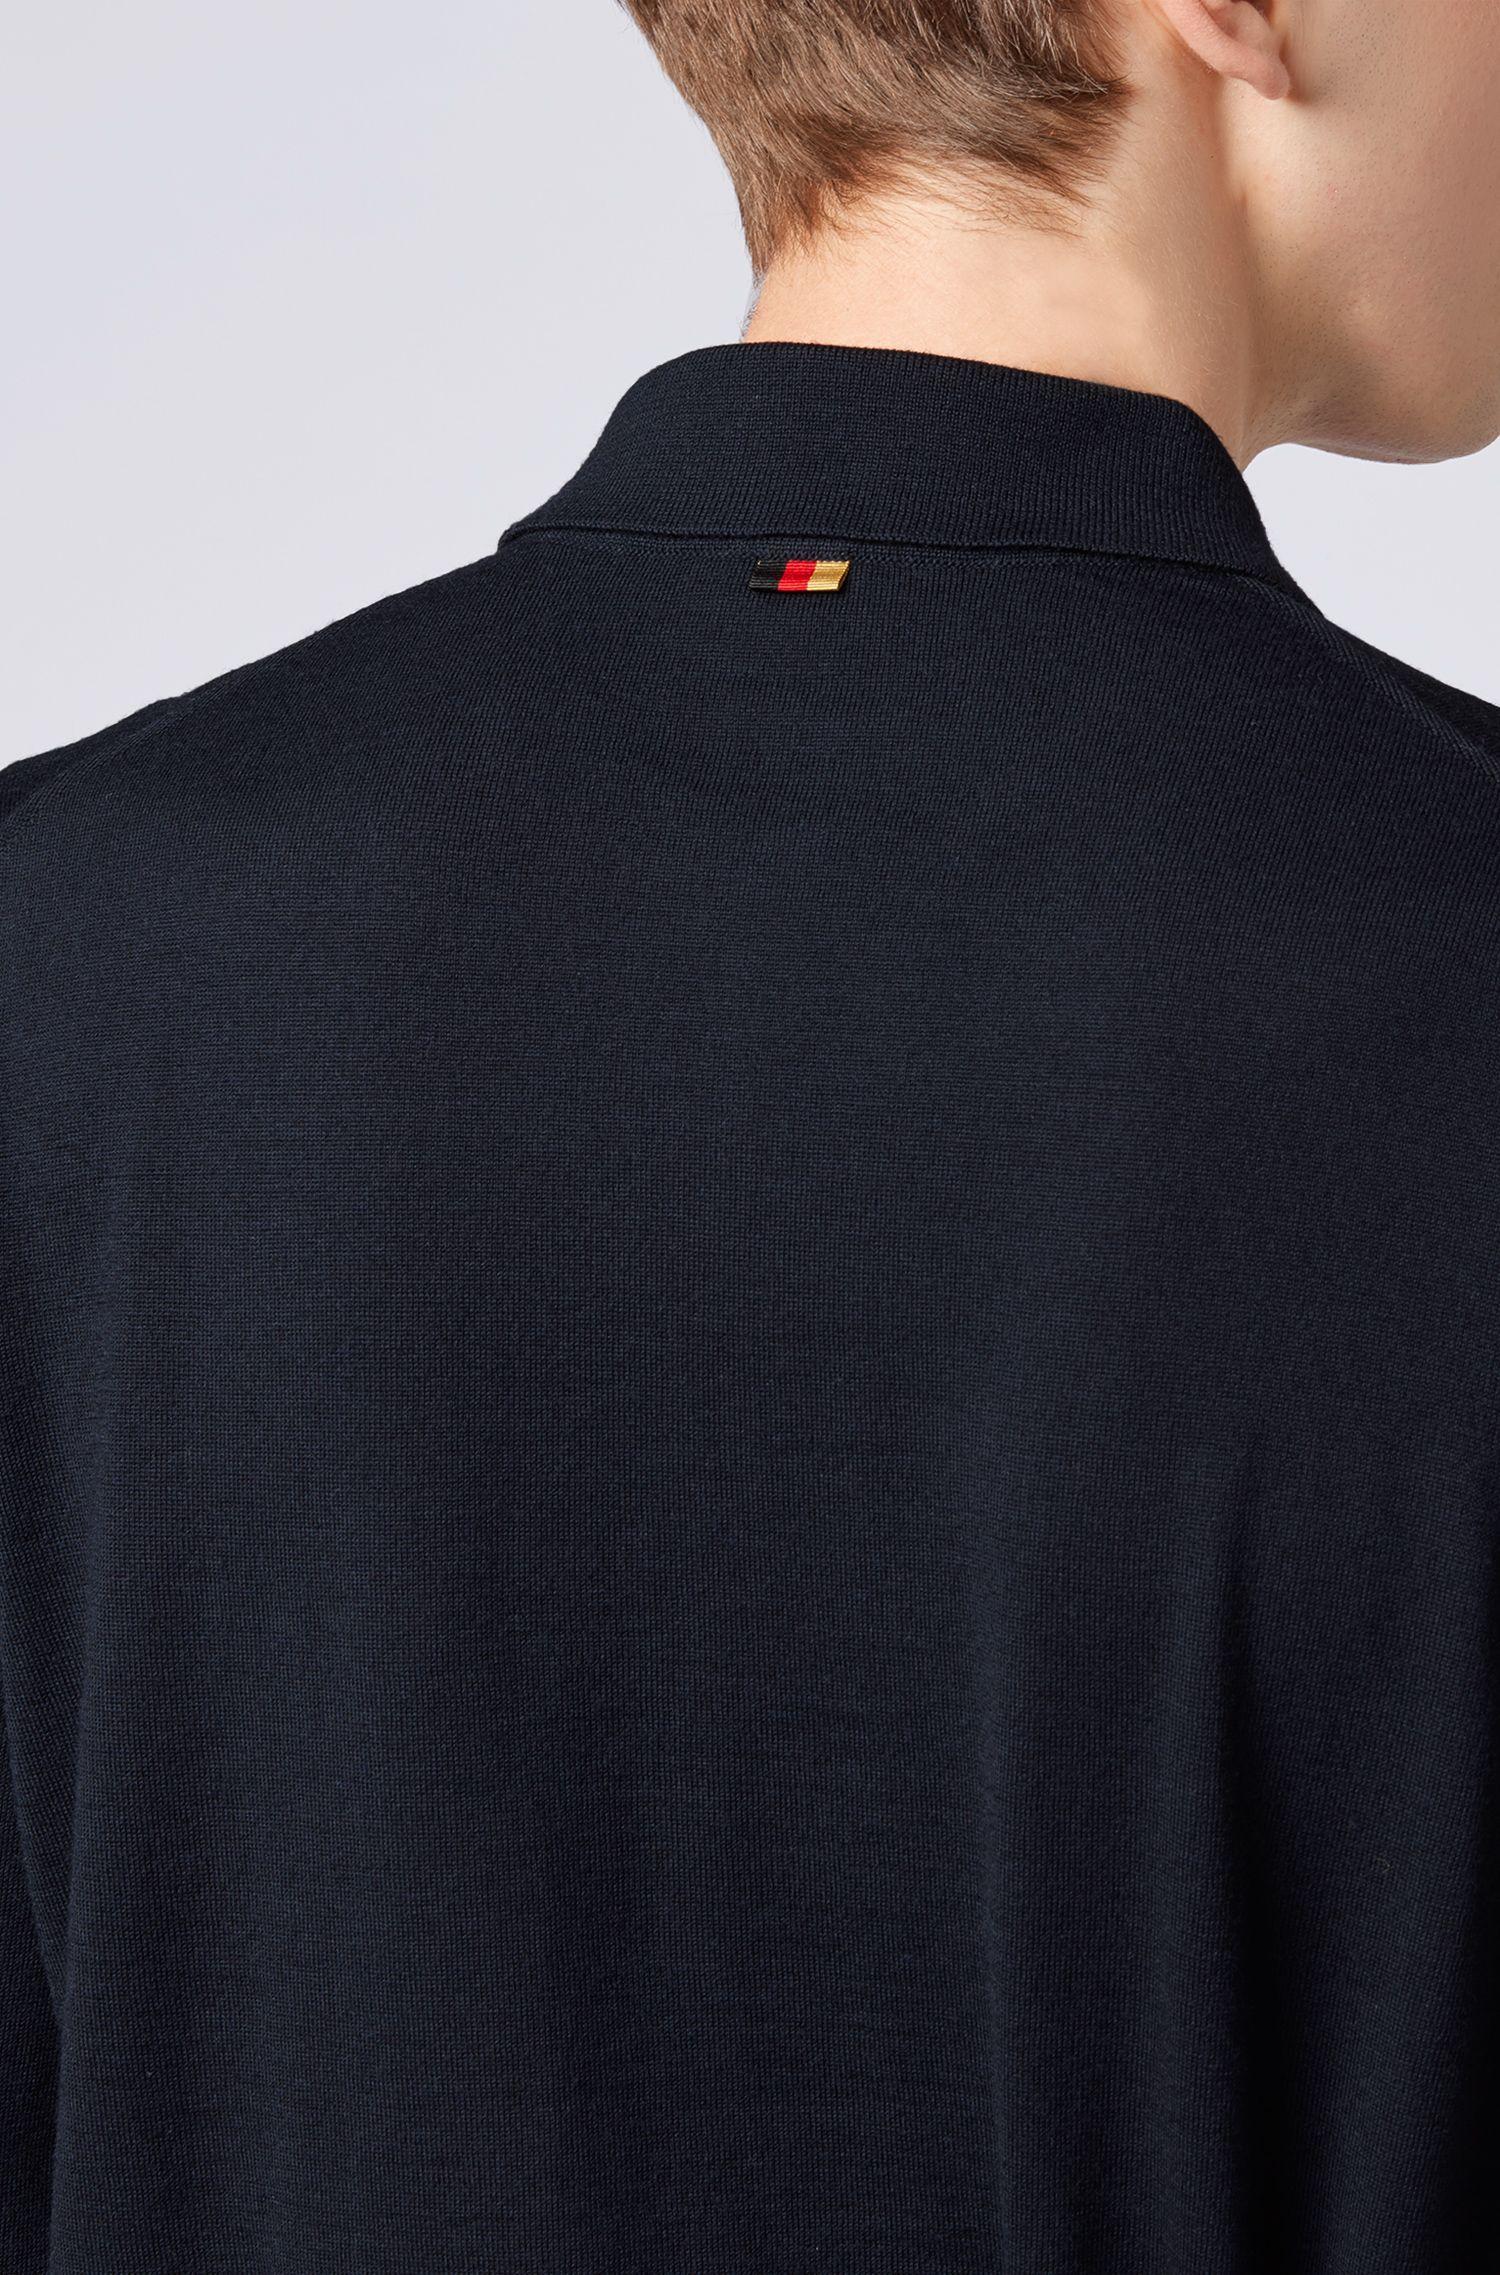 Sweater in virgin wool with polo collar, Dark Blue